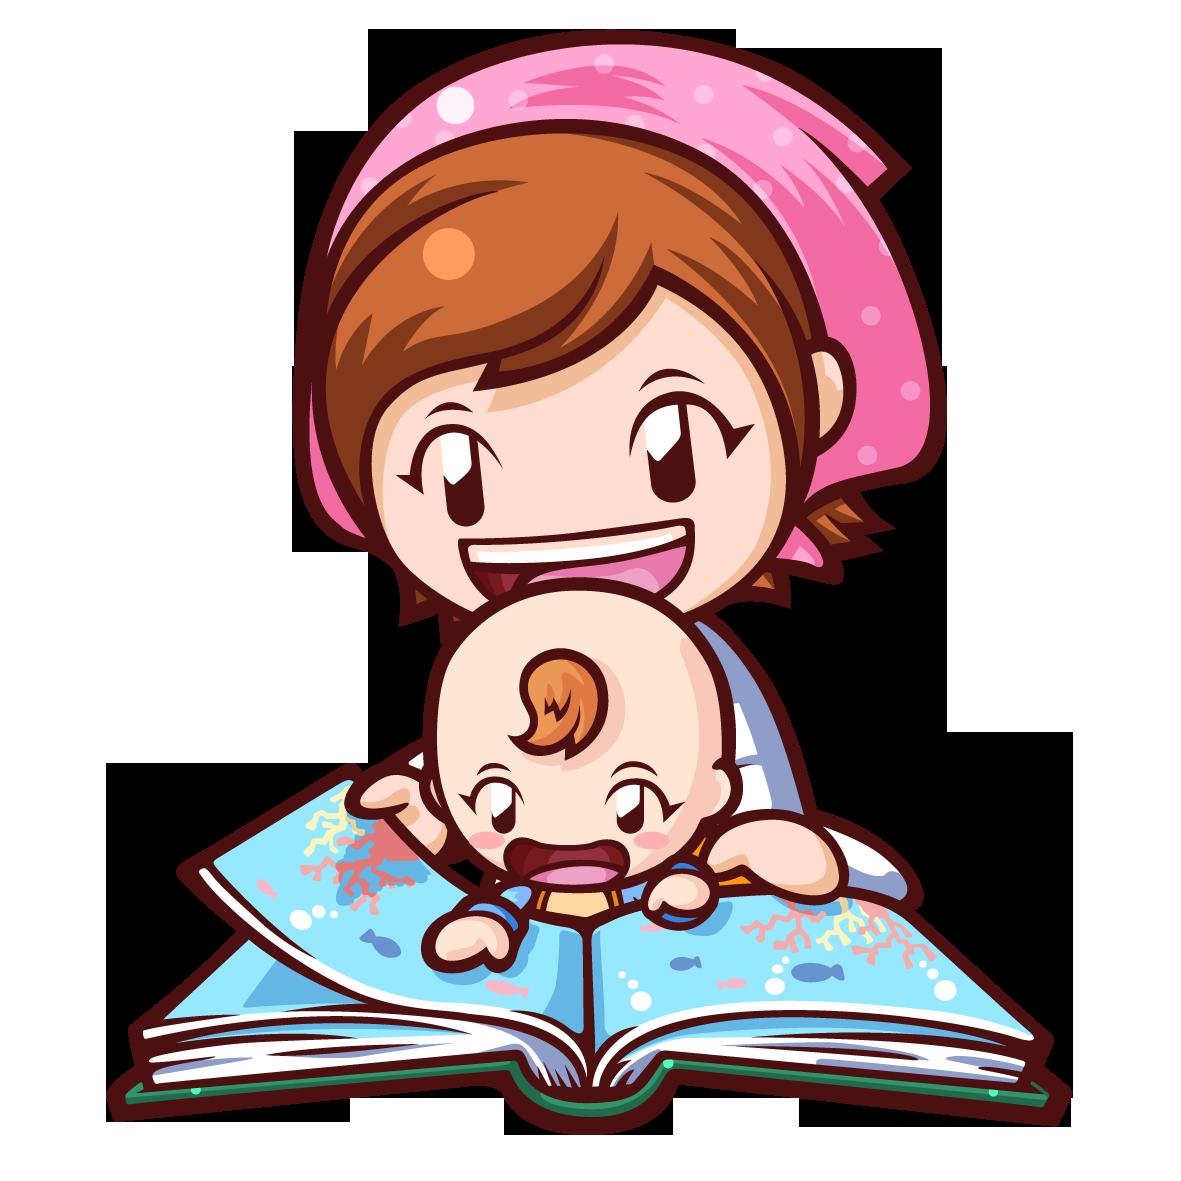 image babysitting mama png cooking mama wiki clipart cookies cupcakes clipart cooking images